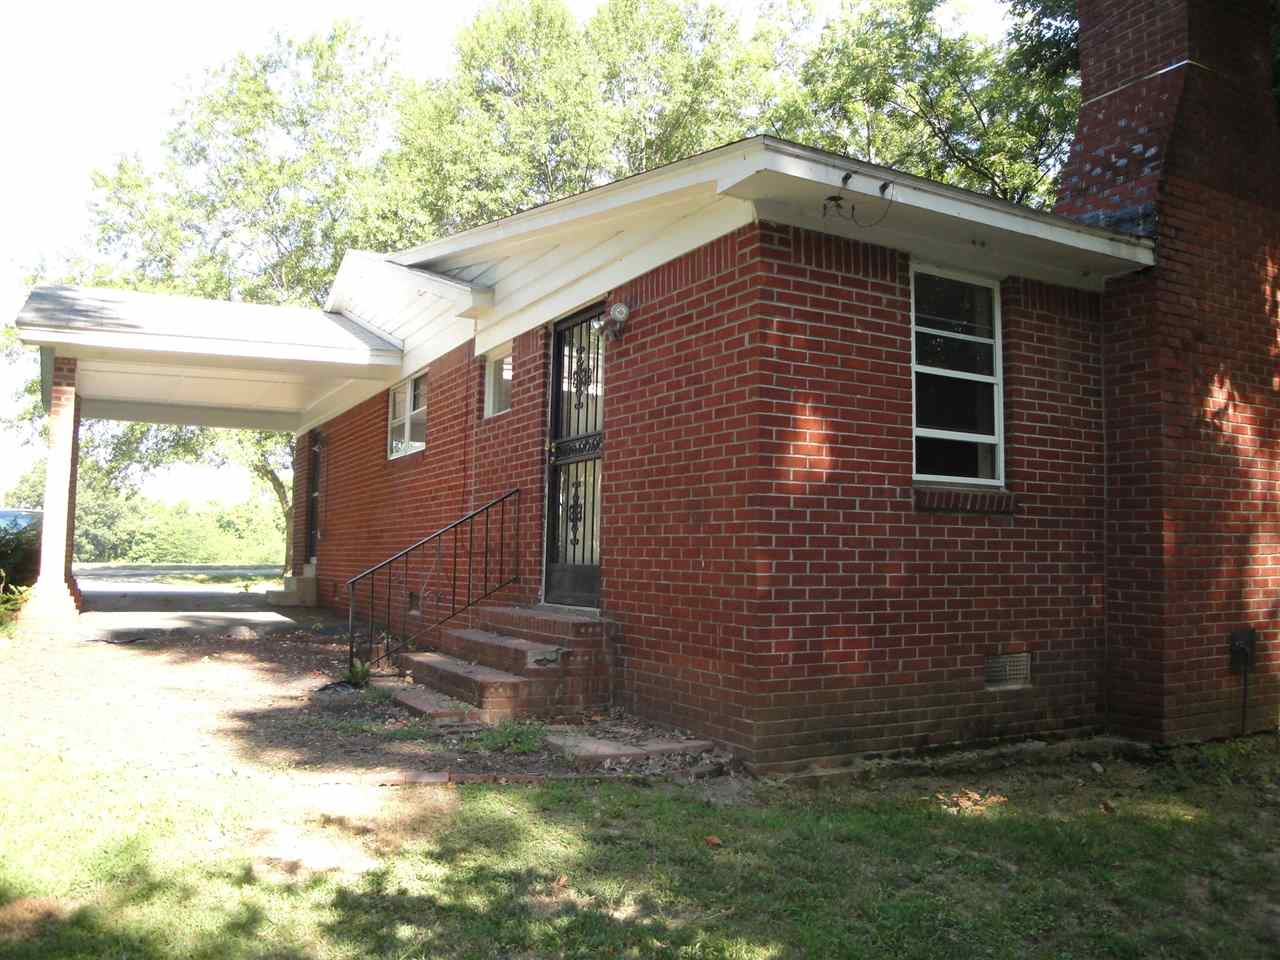 2522 Mcwilliams Covington, TN 38019 - MLS #: 10017521